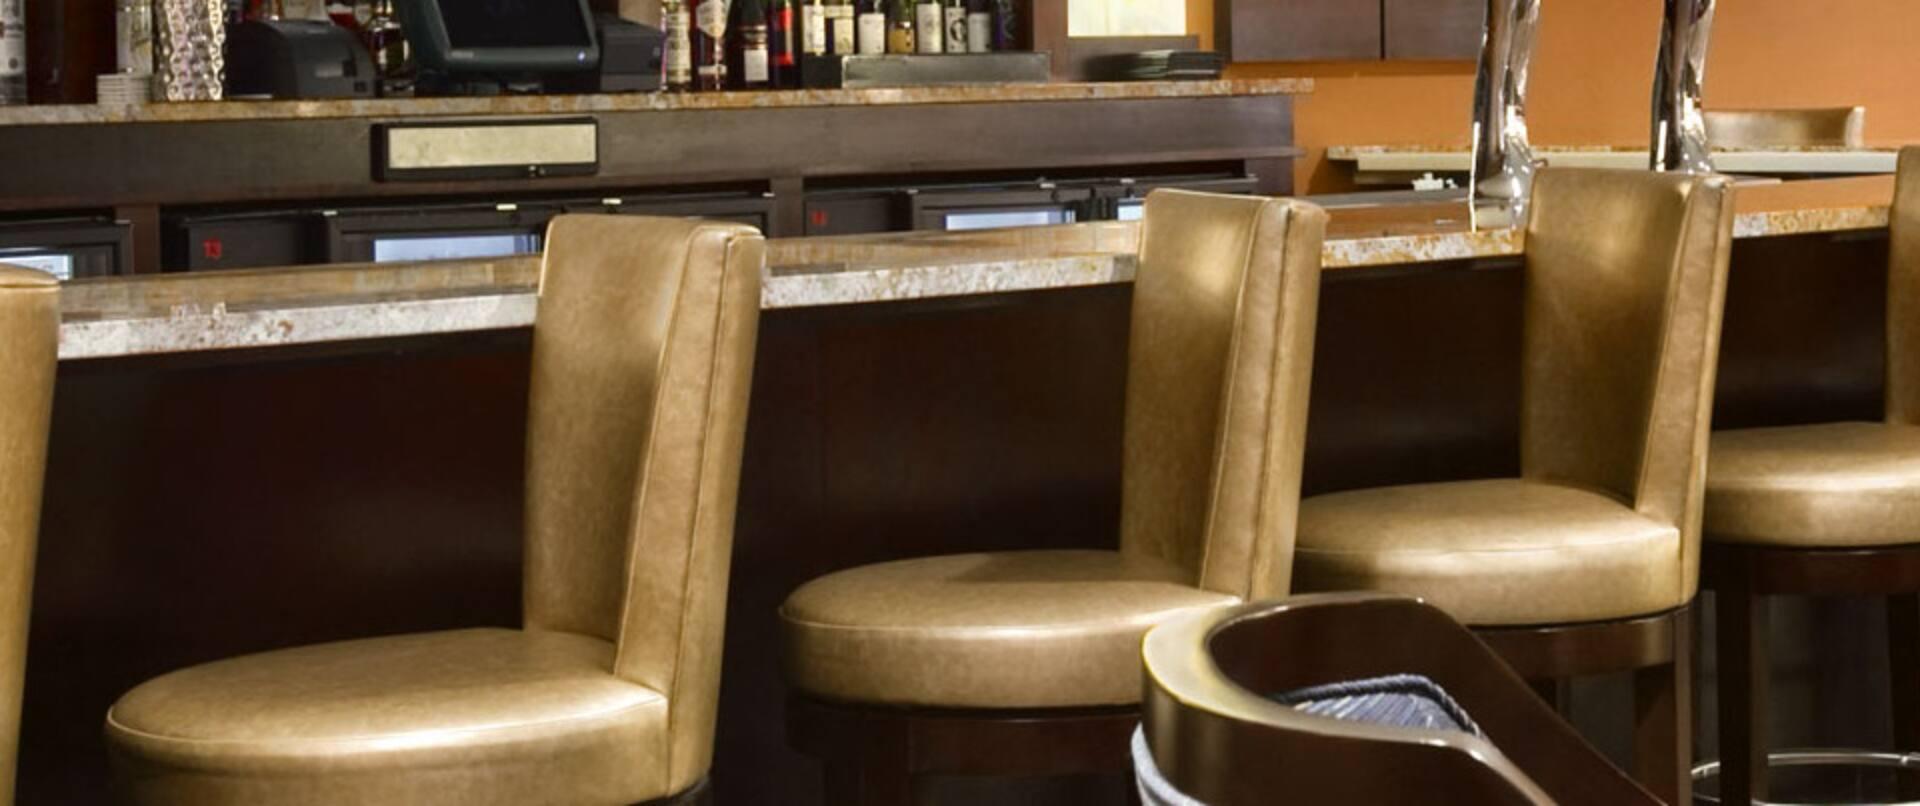 Bar area 144 Restaurant Lounge